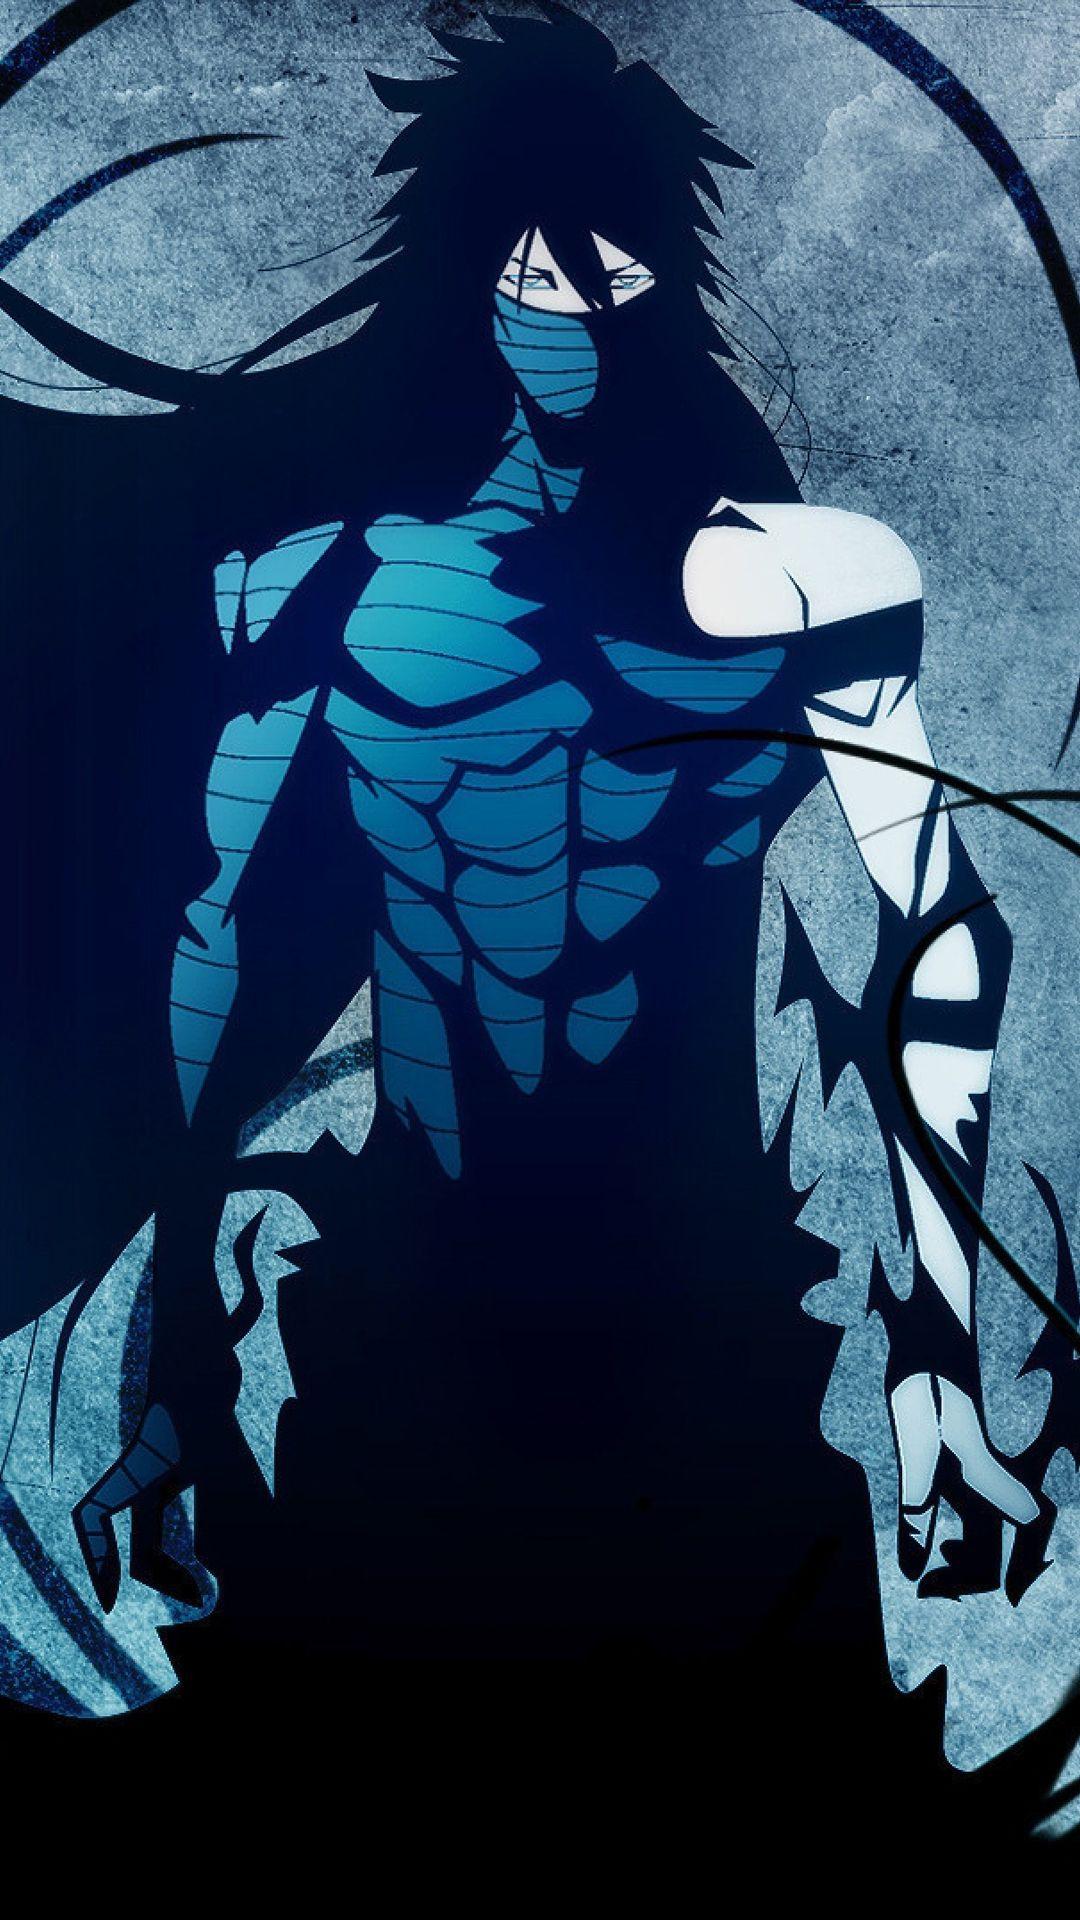 Awesome Hd Bleach Wallpapers Otakukart 1080 1920 Bleach Anime Bleach Anime Art Bleach Fanart